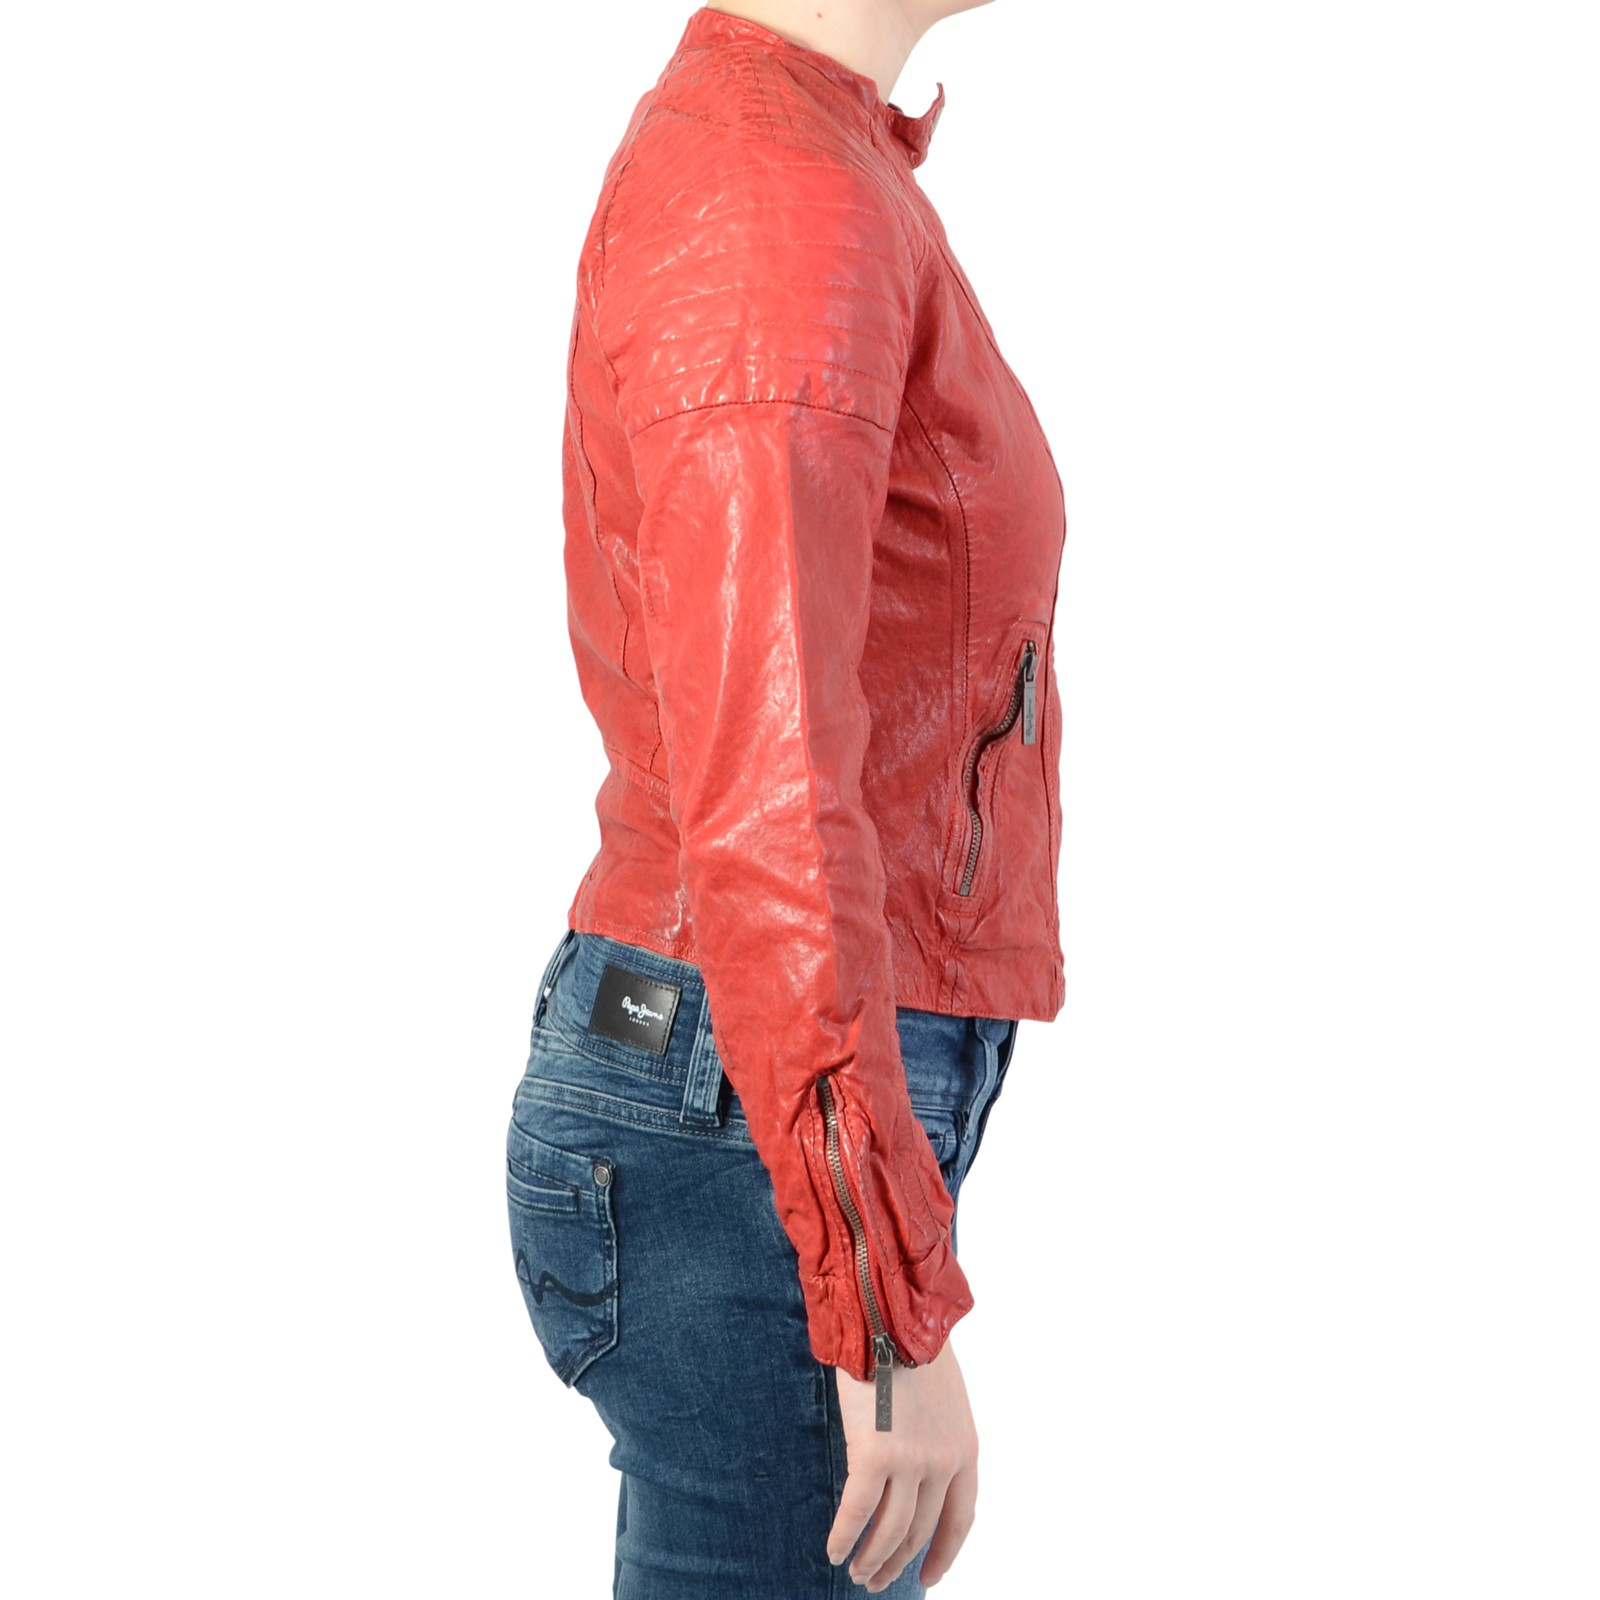 Blouson Cuir Rocky Pepe Ebay Jeans 7vhwr rqq8dwRC